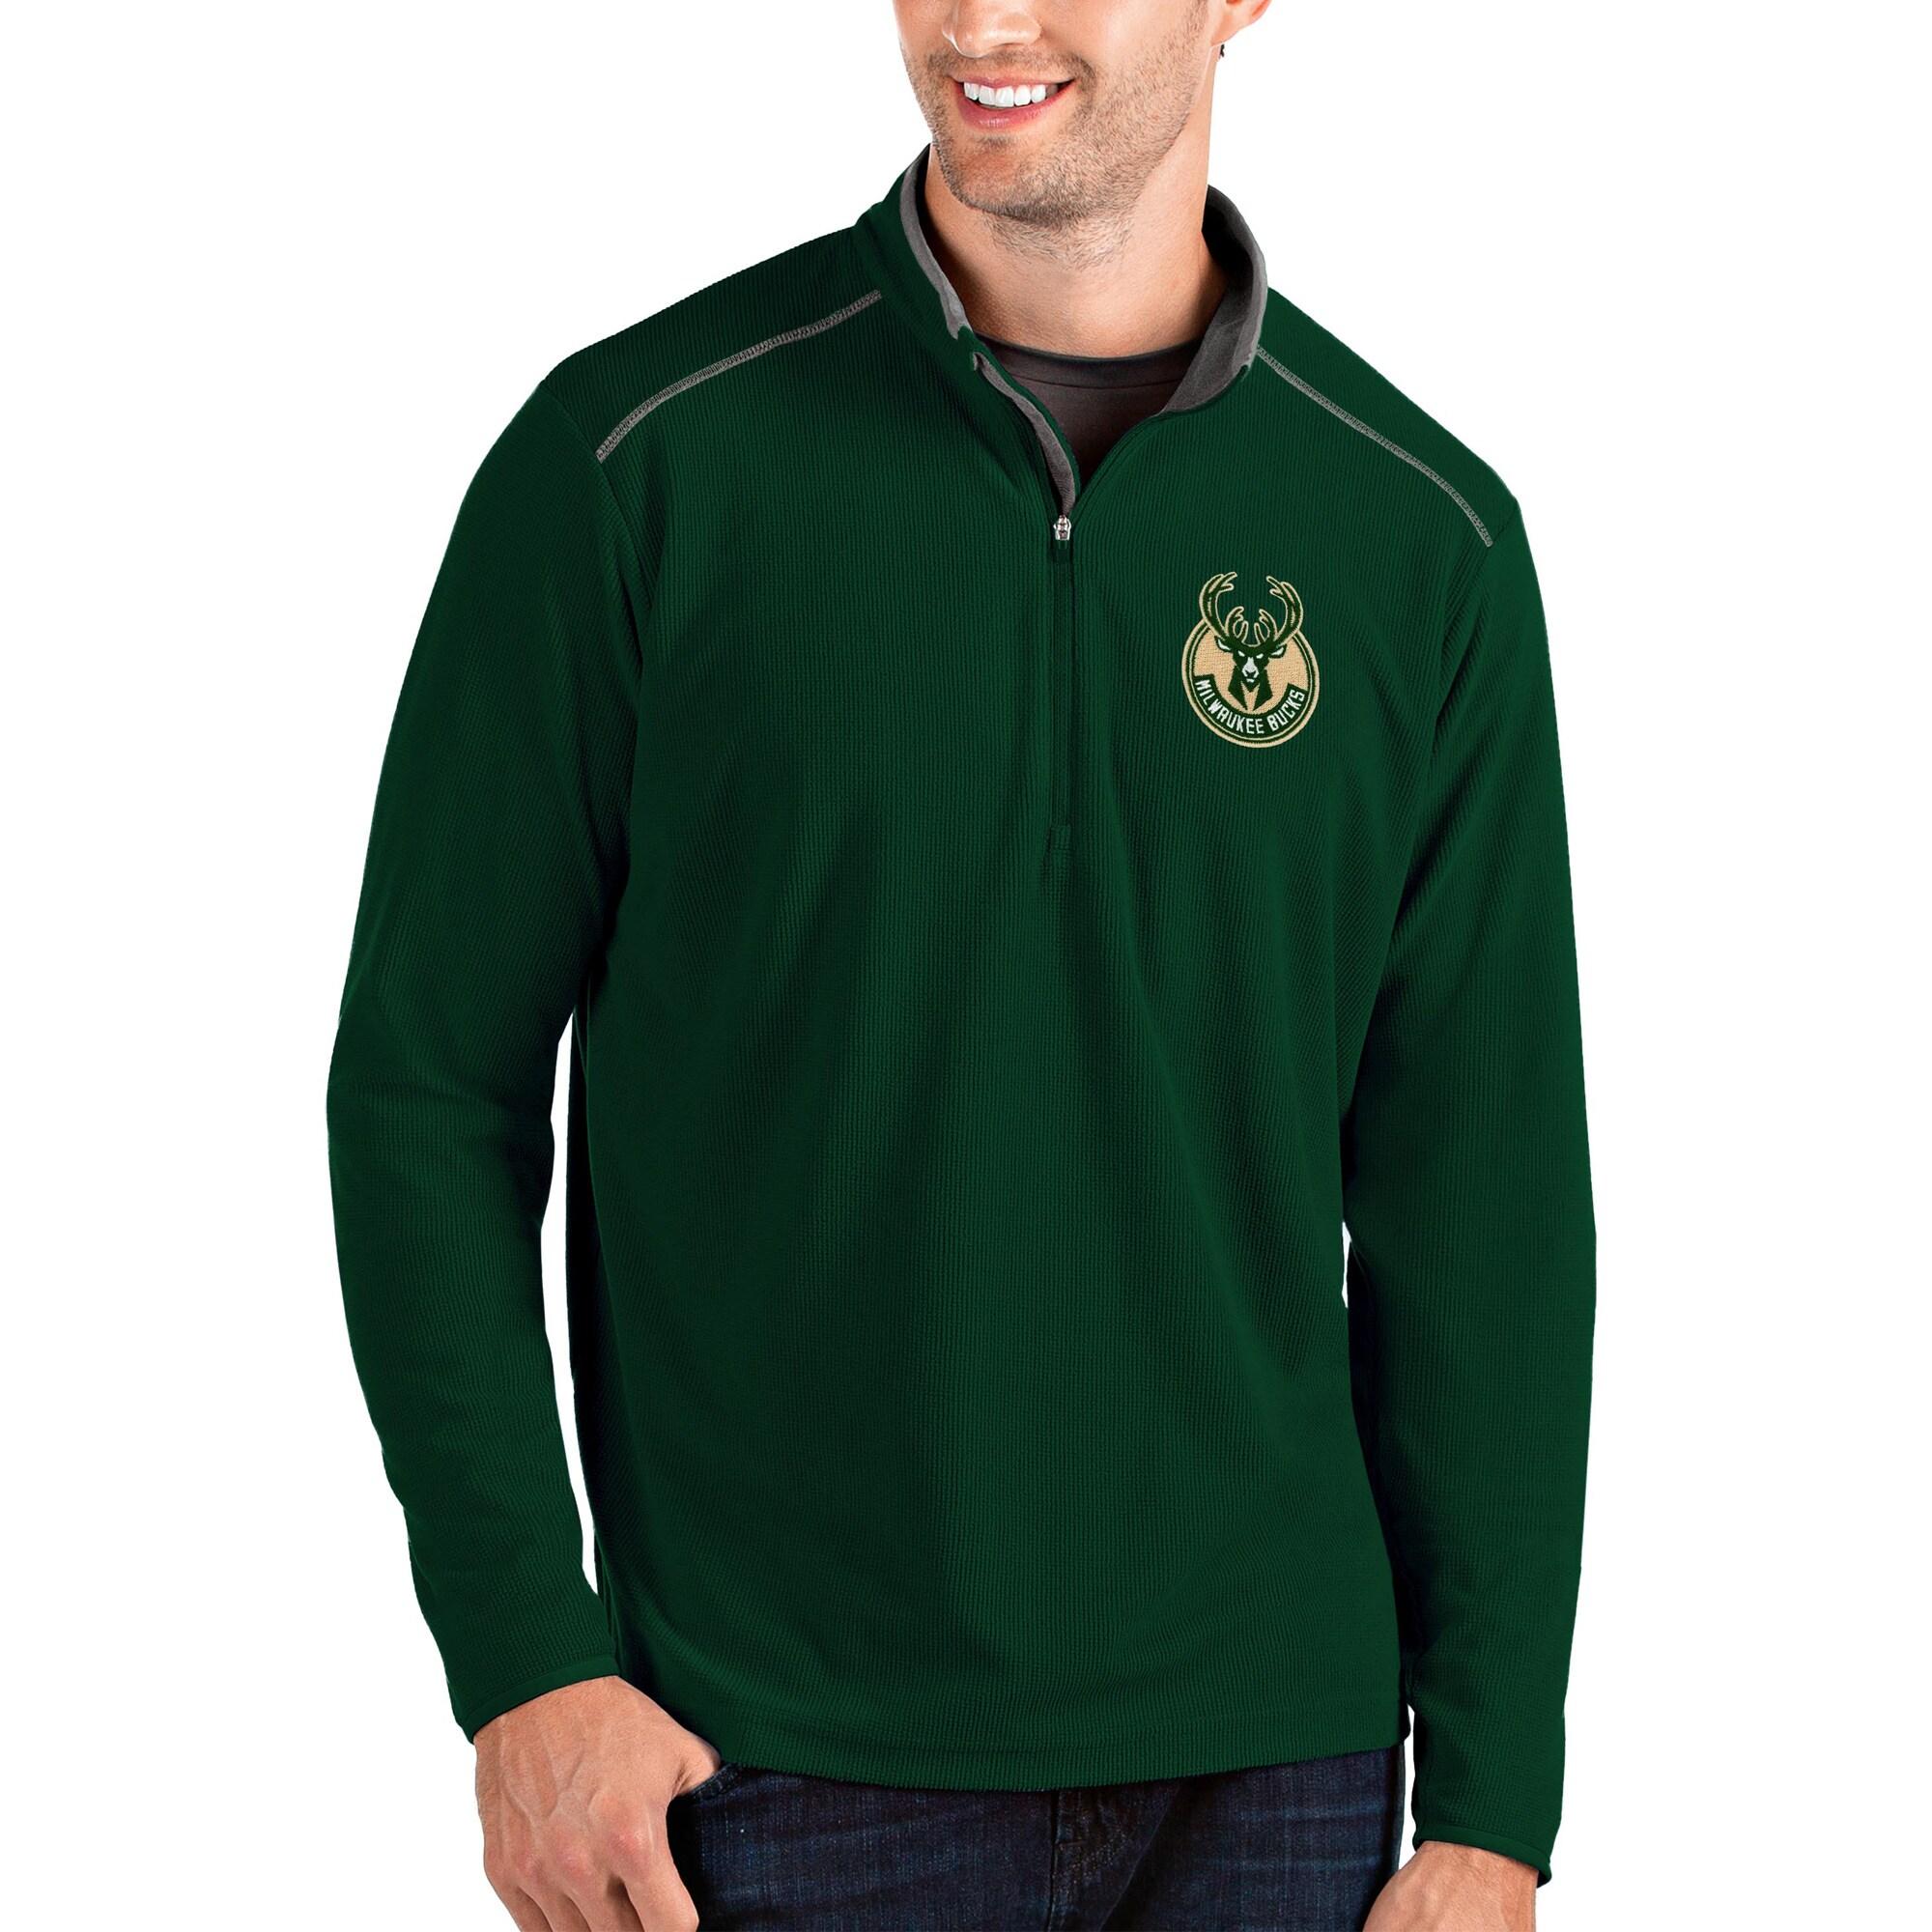 Milwaukee Bucks Antigua Glacier Quarter-Zip Pullover Jacket - Green/Gray